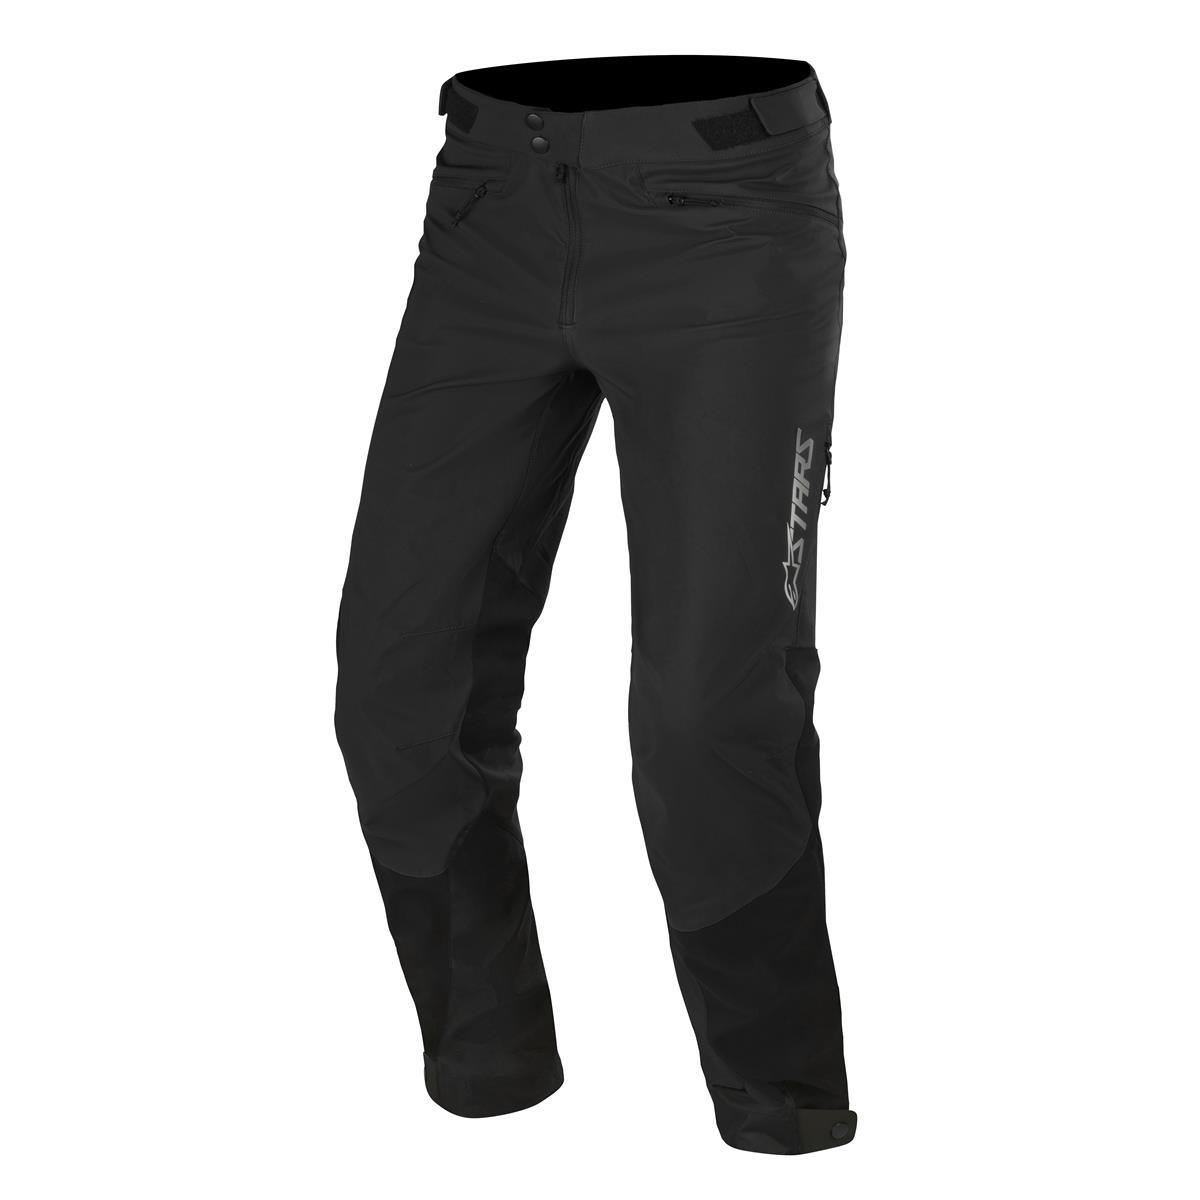 alpinestars nevada pants pantaloni lungi negru deporvillage offroad maciag hose distribuiti tweet trousers lunghi fondello senza nero